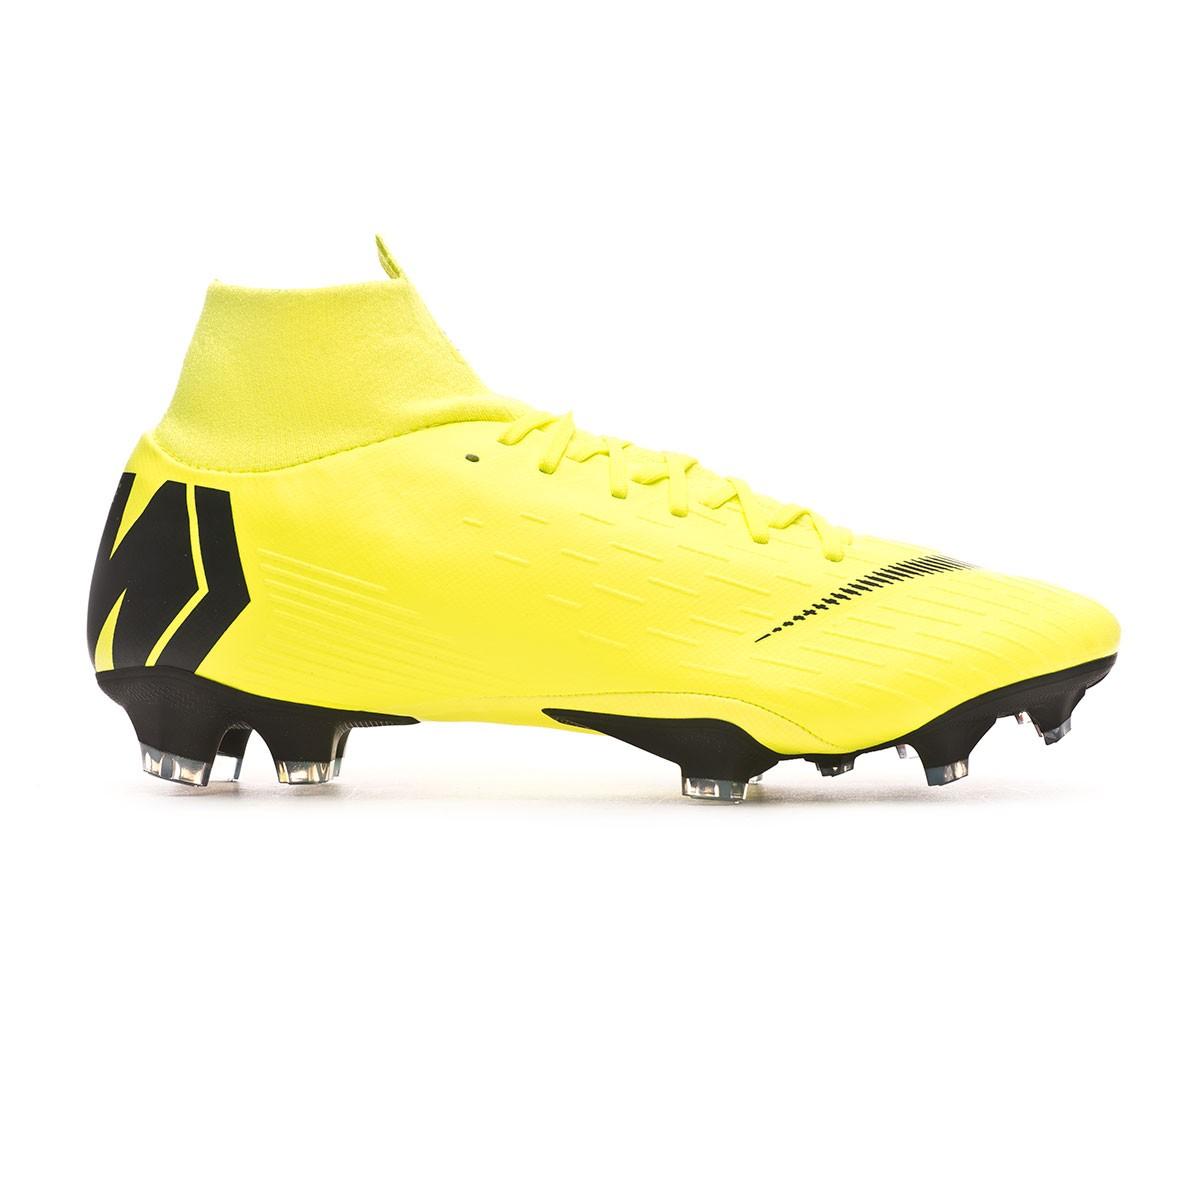 quality design a6136 119c3 Boot Nike Mercurial Superfly VI Pro FG Volt-Black - Leaked soccer